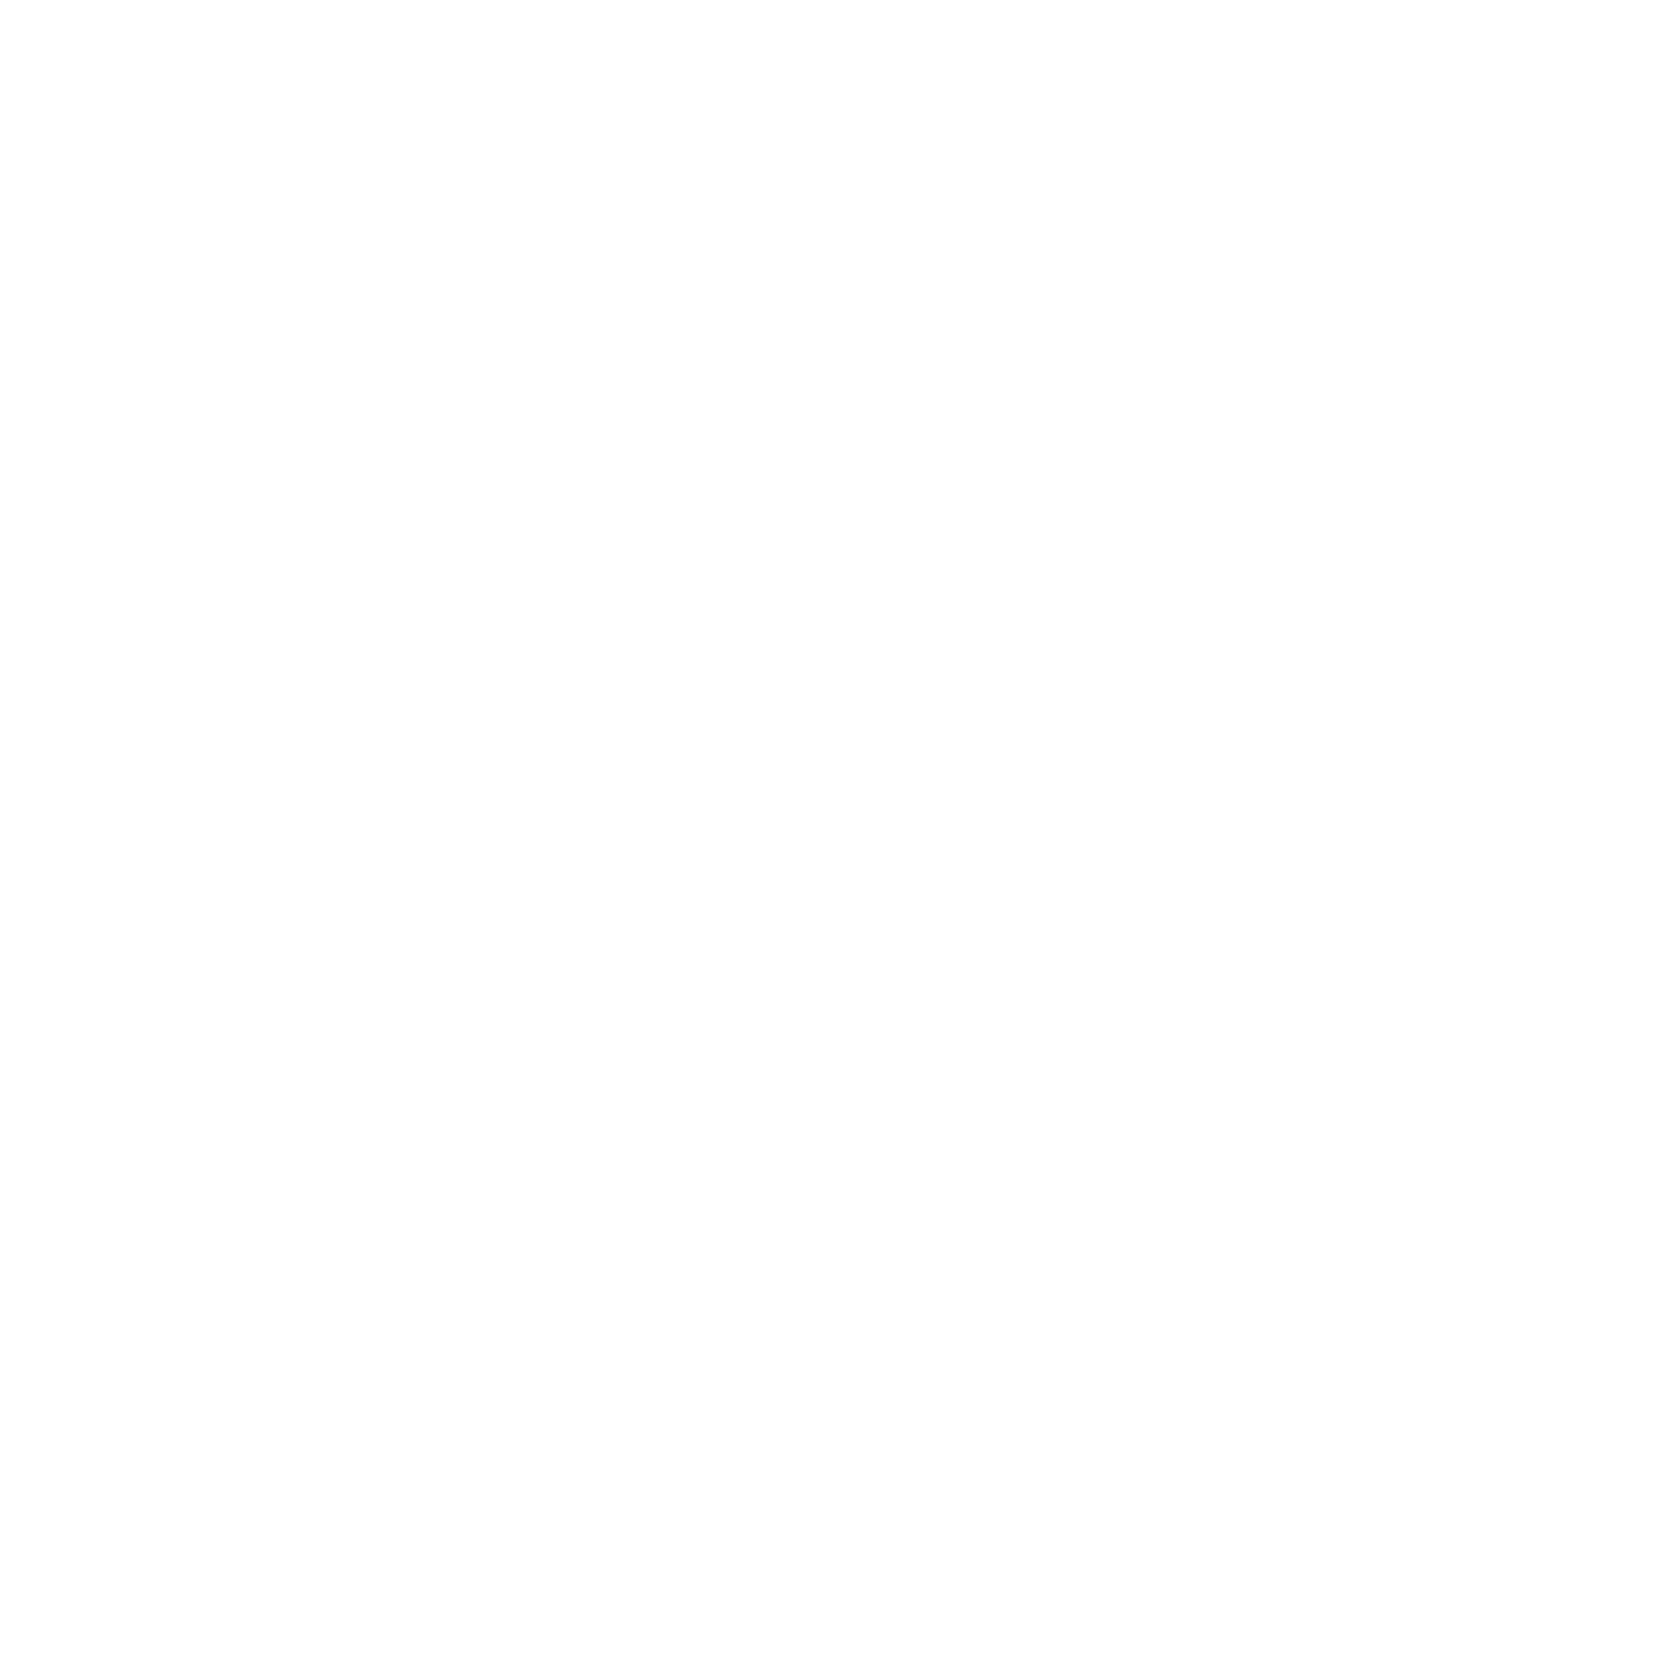 EGO STUDIO «VIP Massage» салон эротического массажа премиум класса Симферополь, ул. Калинина 35 +7 (989) 211-17-01